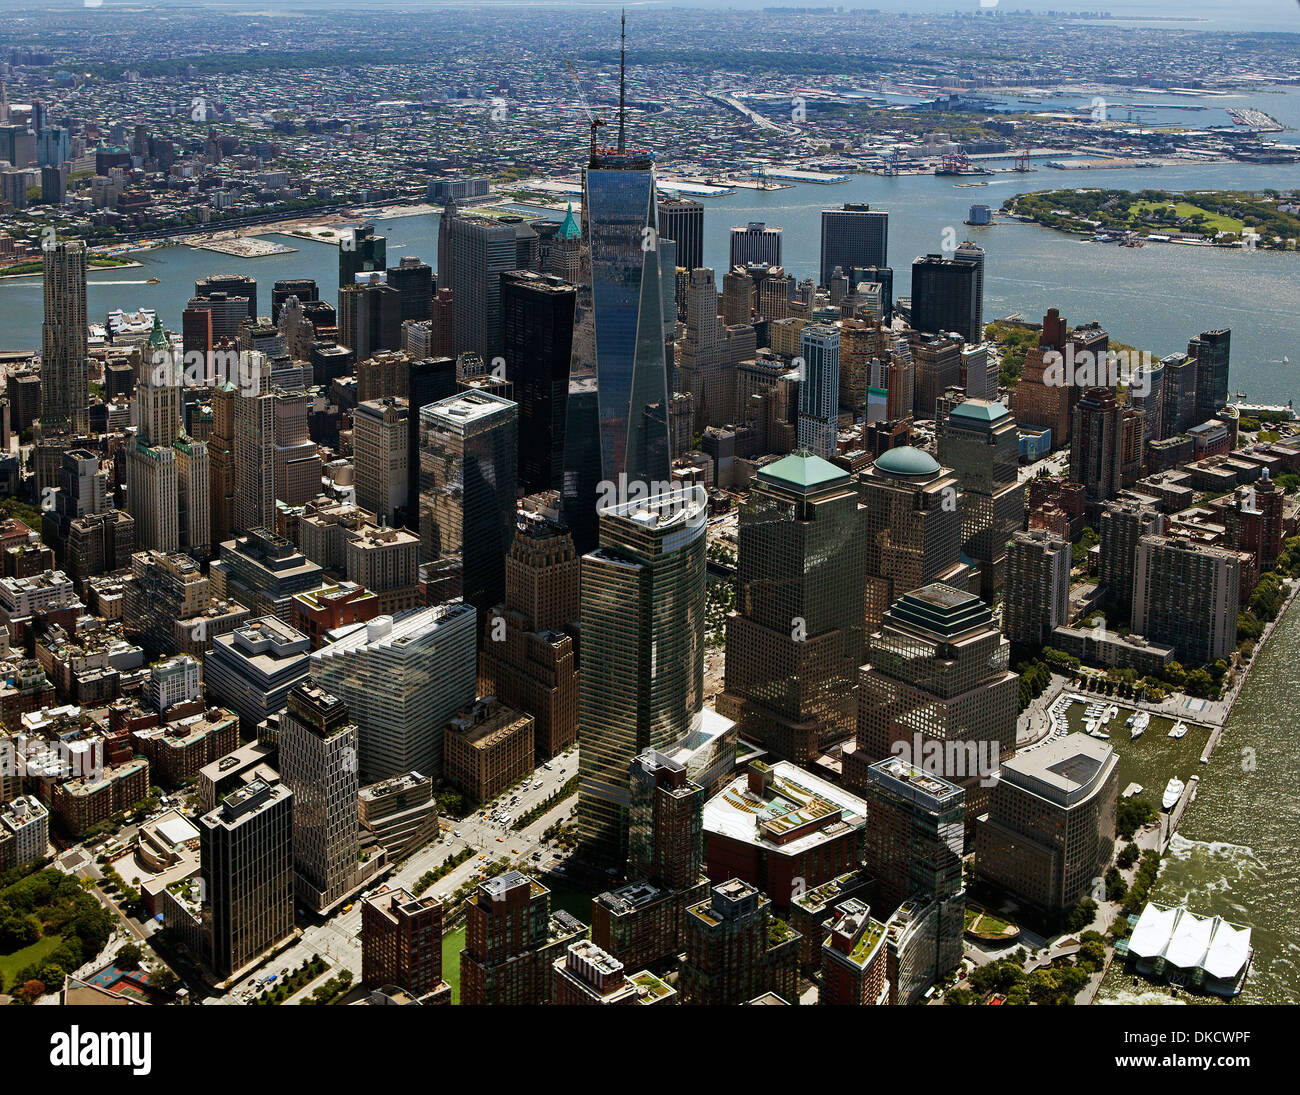 aerial photograph One World Trade Center, World Financial Center, Lower Manhattan, New York City - Stock Image